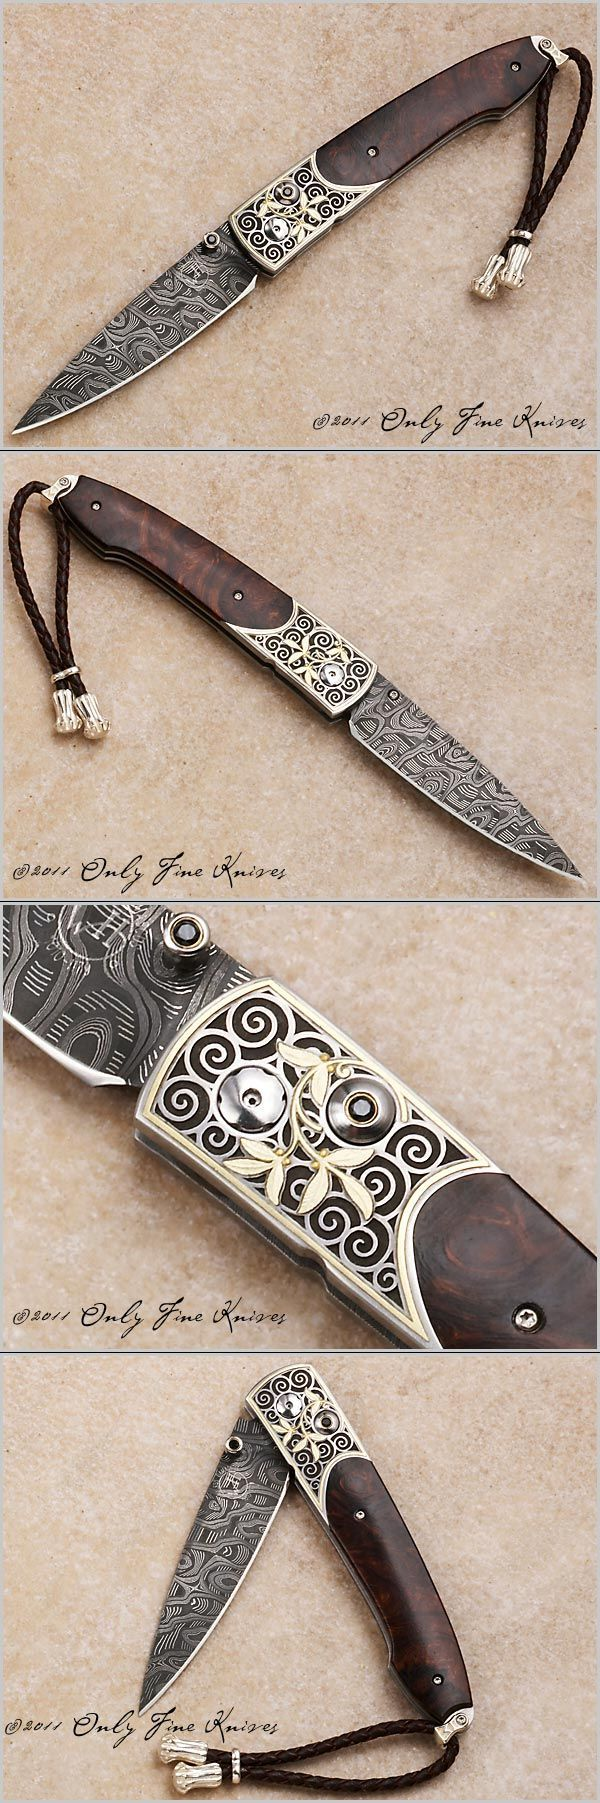 William Henry, B05 Custom 110310, Only Fine Knives..5000 @aegisgears